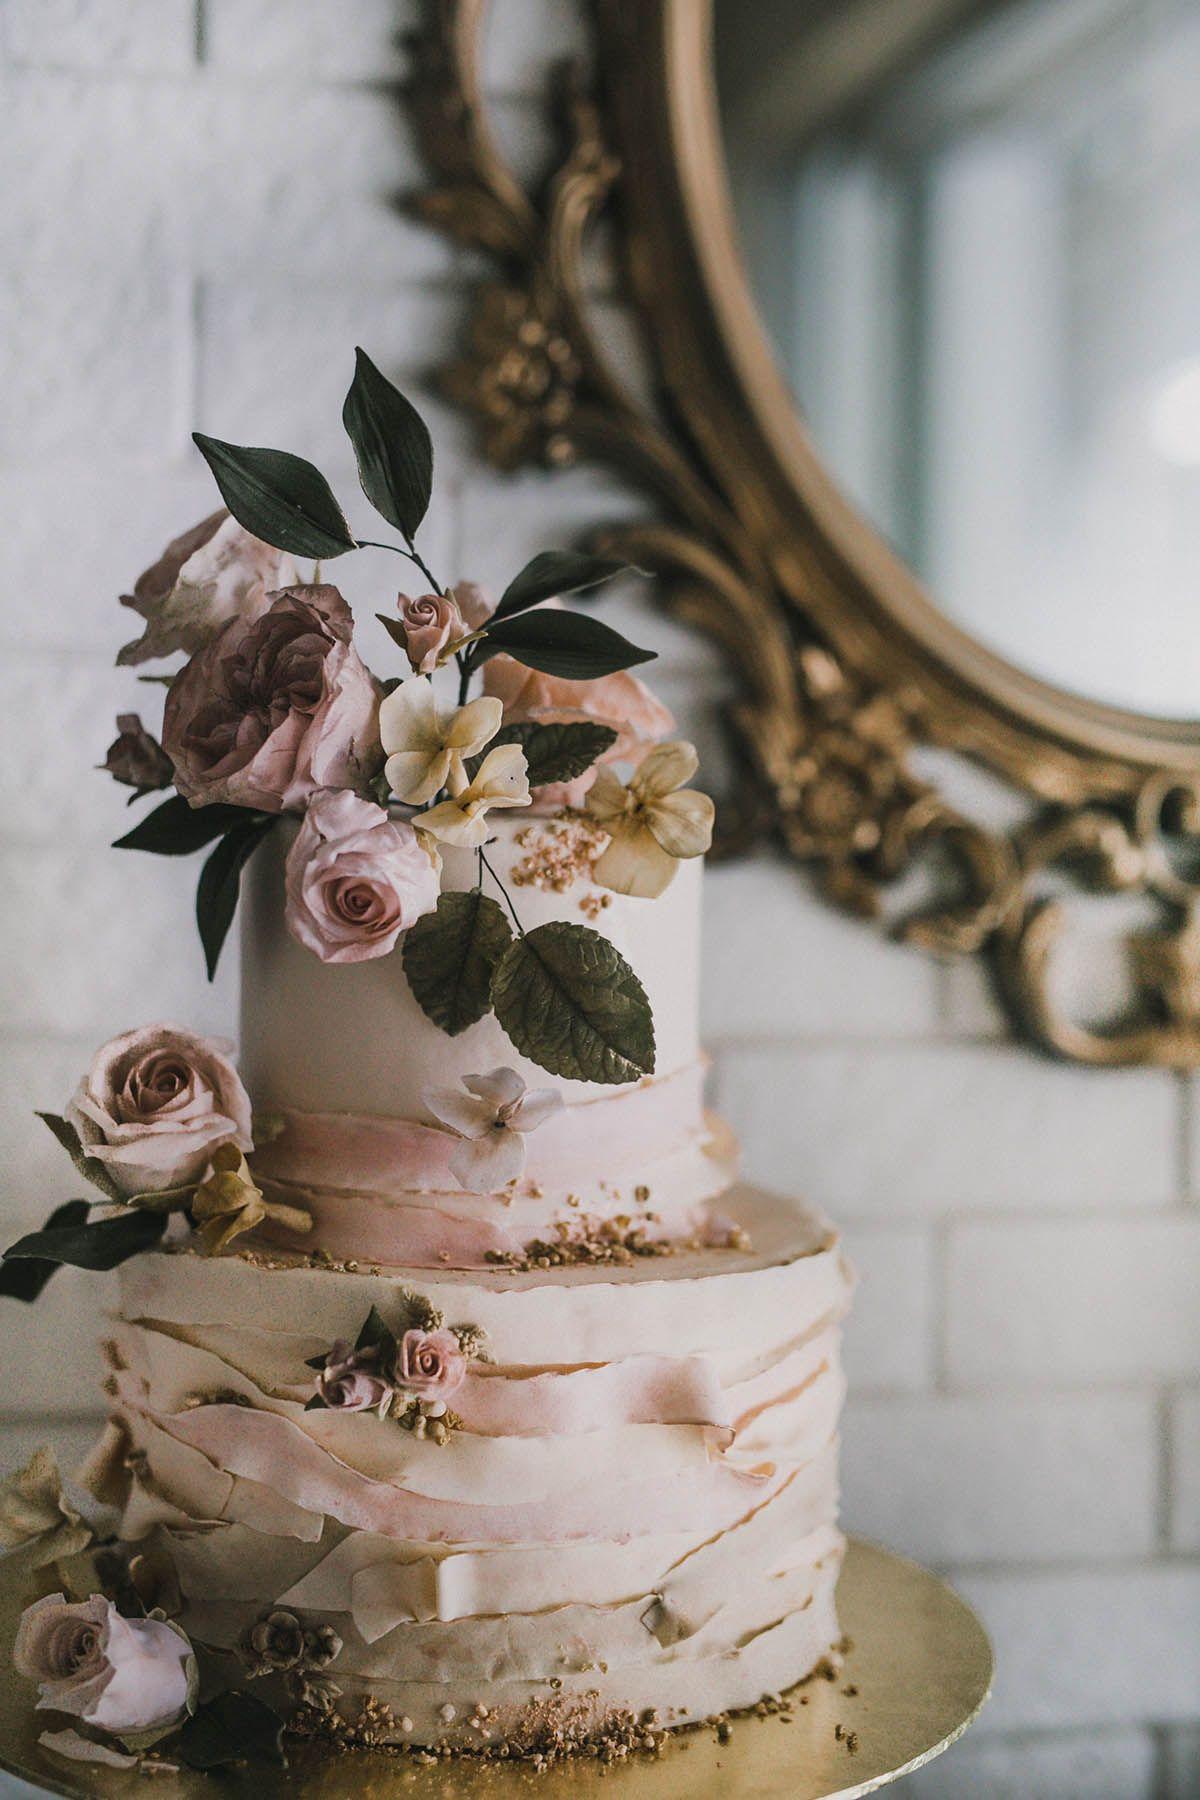 Gallery u cakes u winifred kriste cake sugar flower inspiration